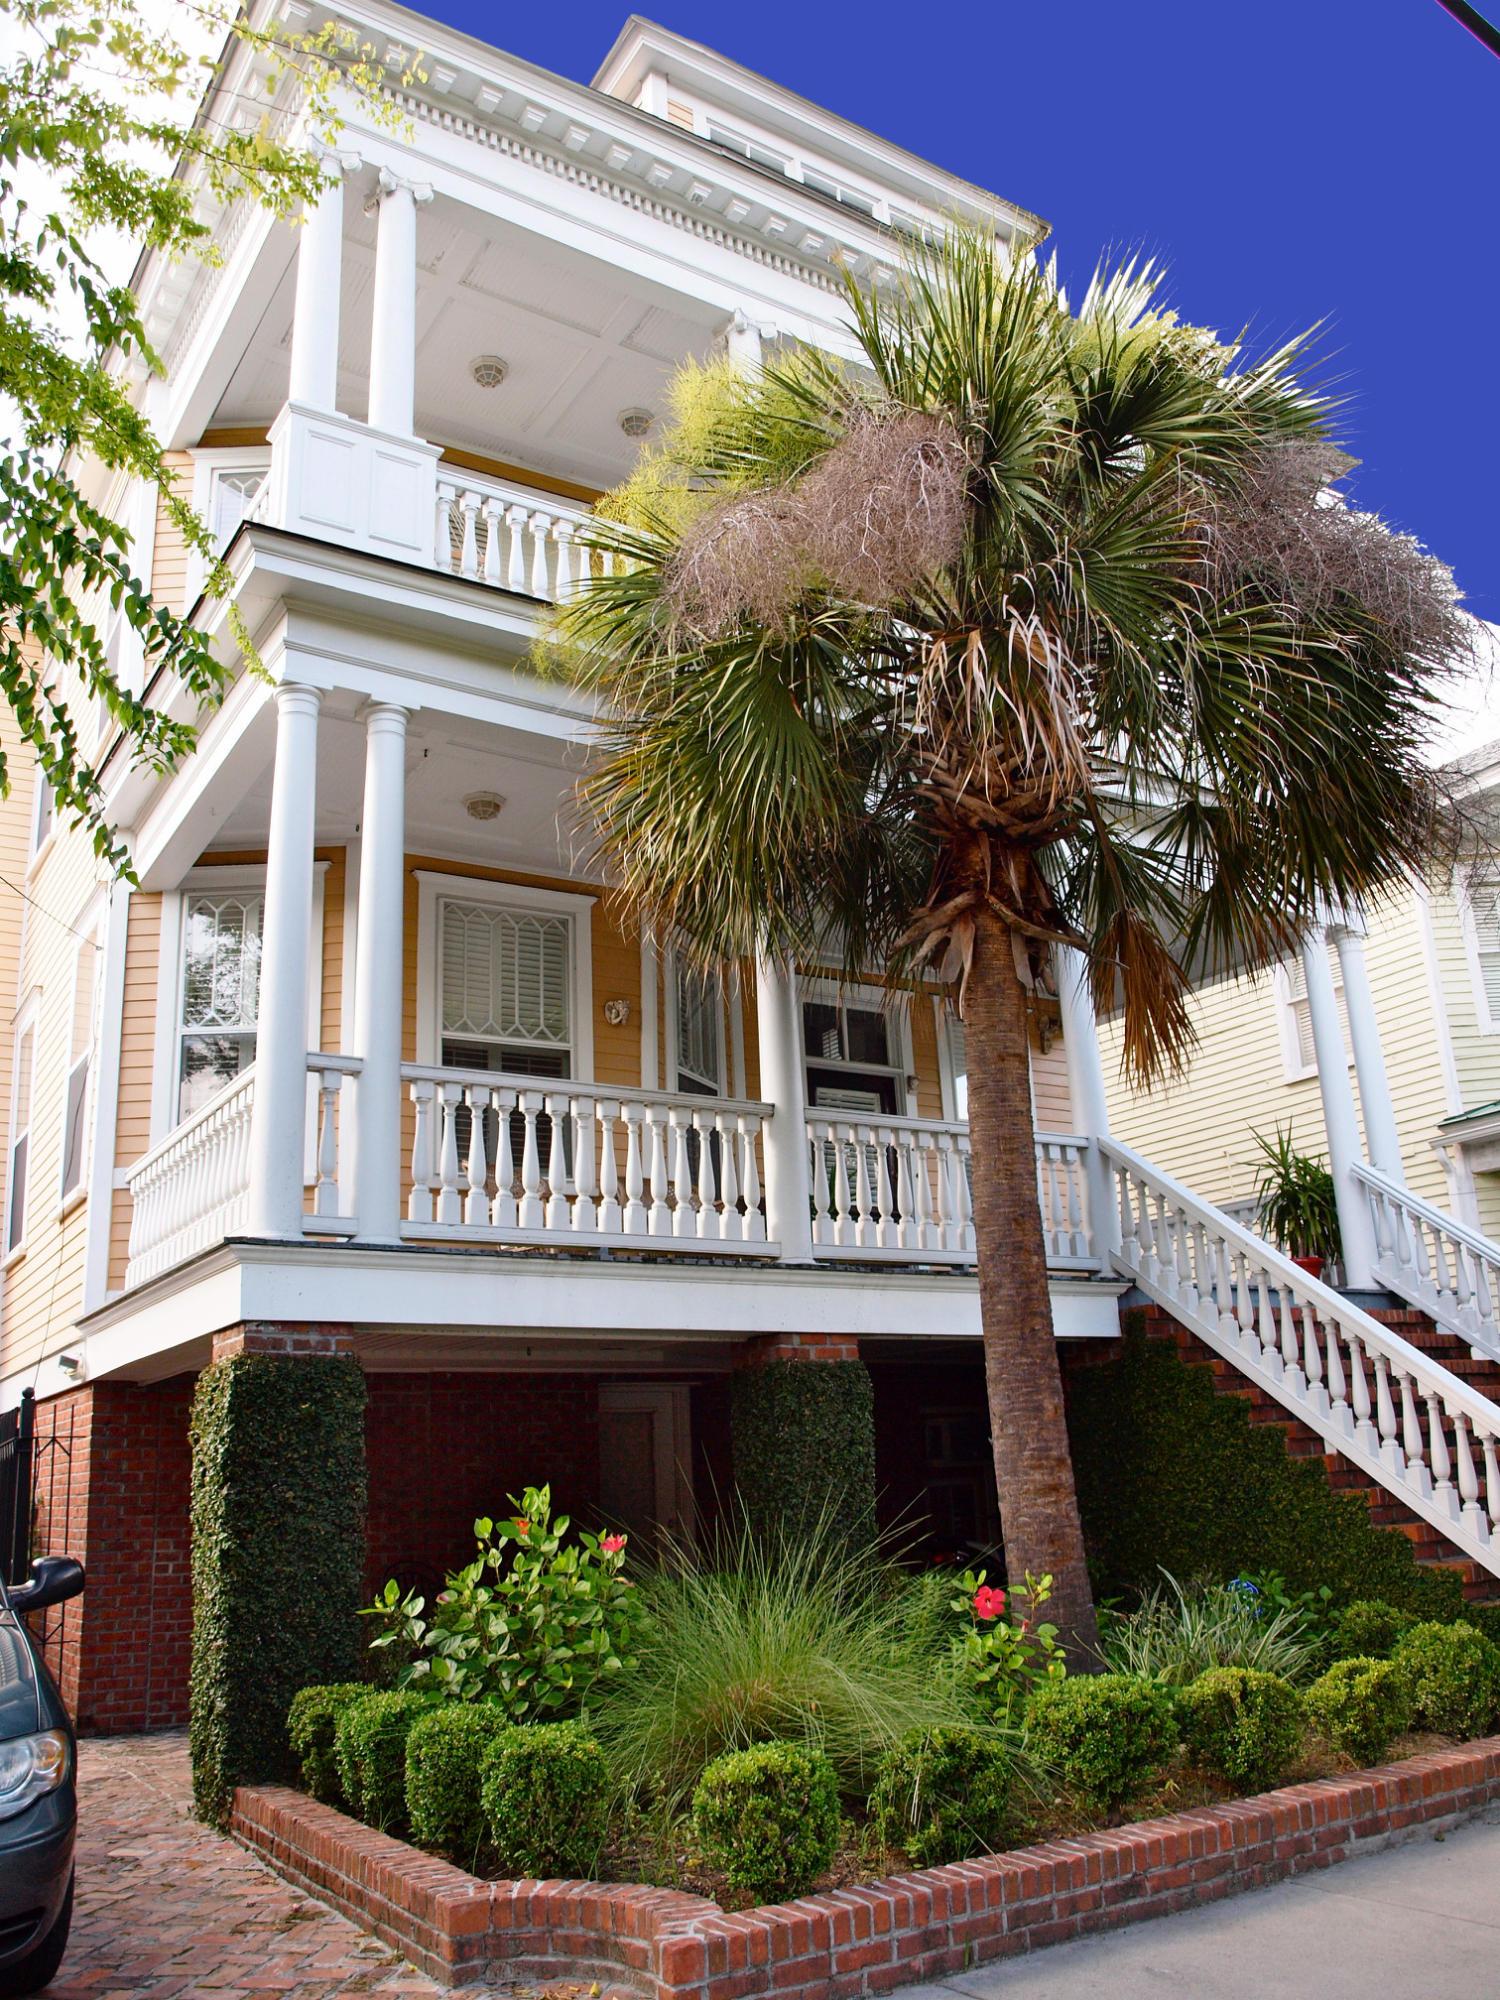 Home for sale 22 Bennett Street, Harleston Village, Downtown Charleston, SC